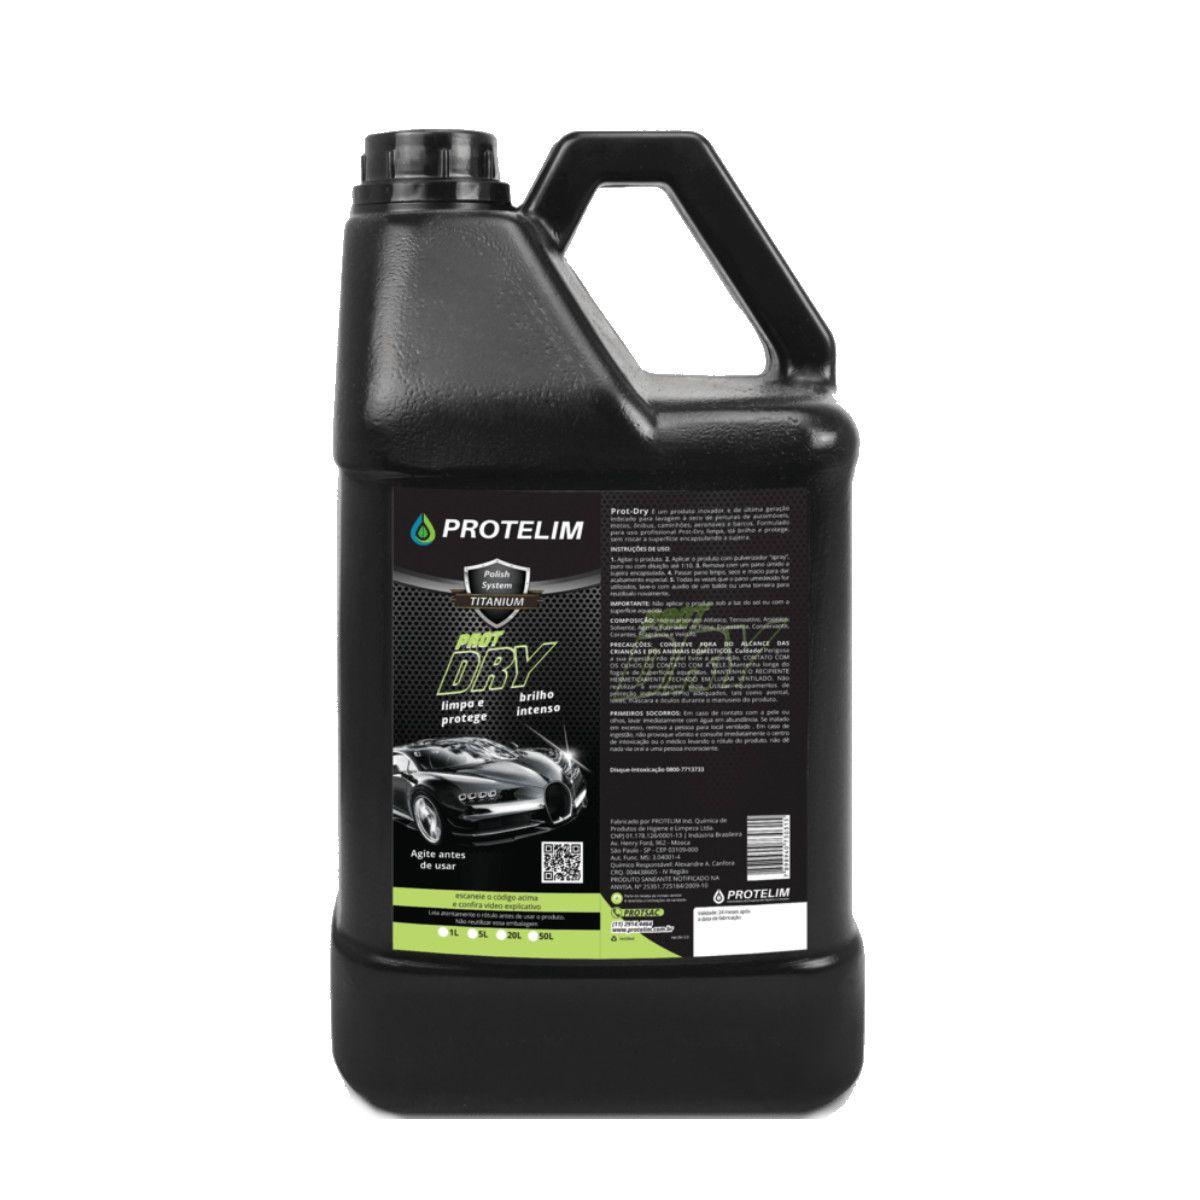 Limpador A Seco Prot-Dry Protelim 5l Limpeza Ecológica